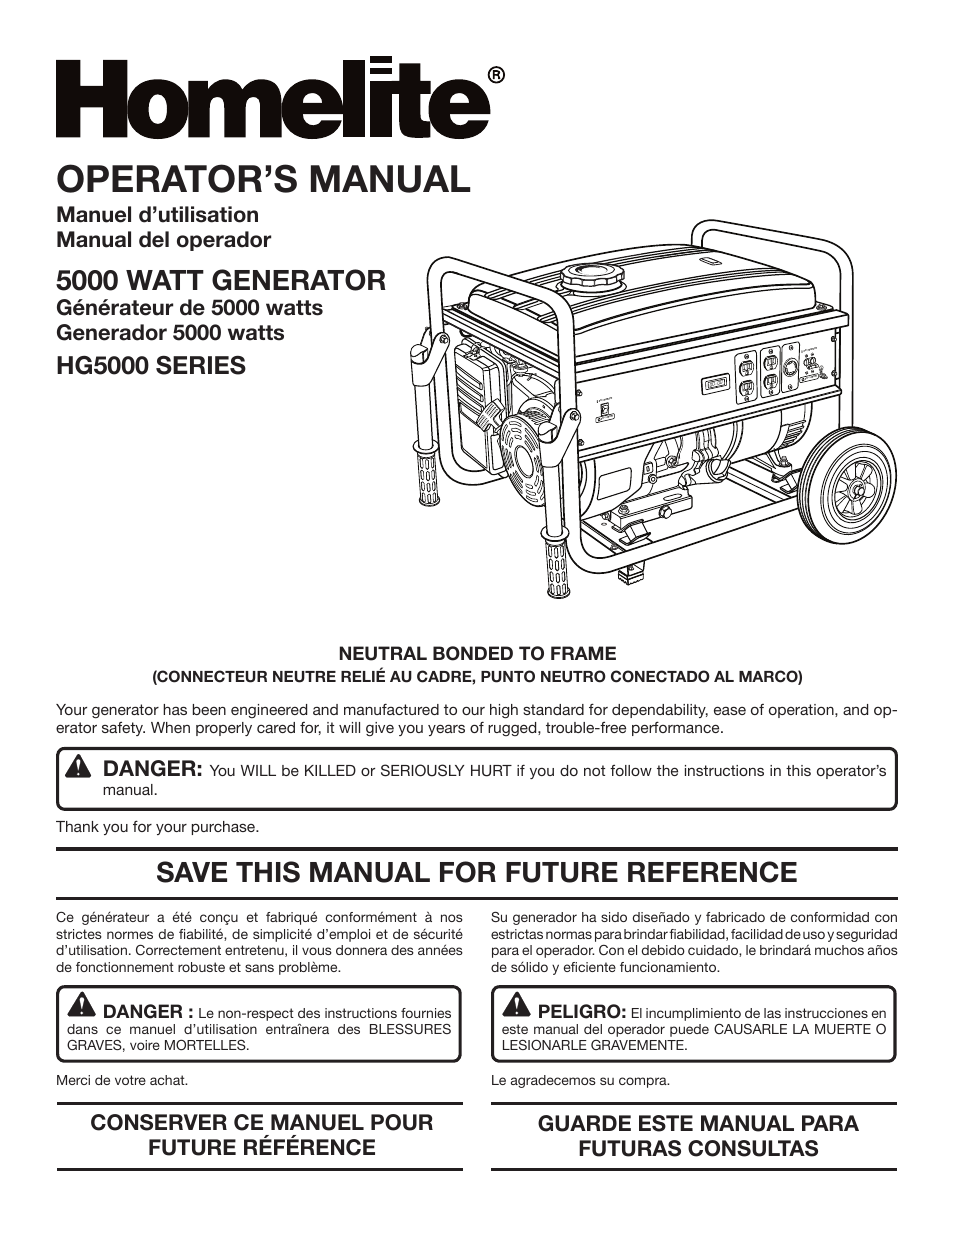 homelite hg5000 user manual 60 pages original mode rh manualsdir com Homelite Blower Vac Manual Homelite Chainsaw Manual PDF